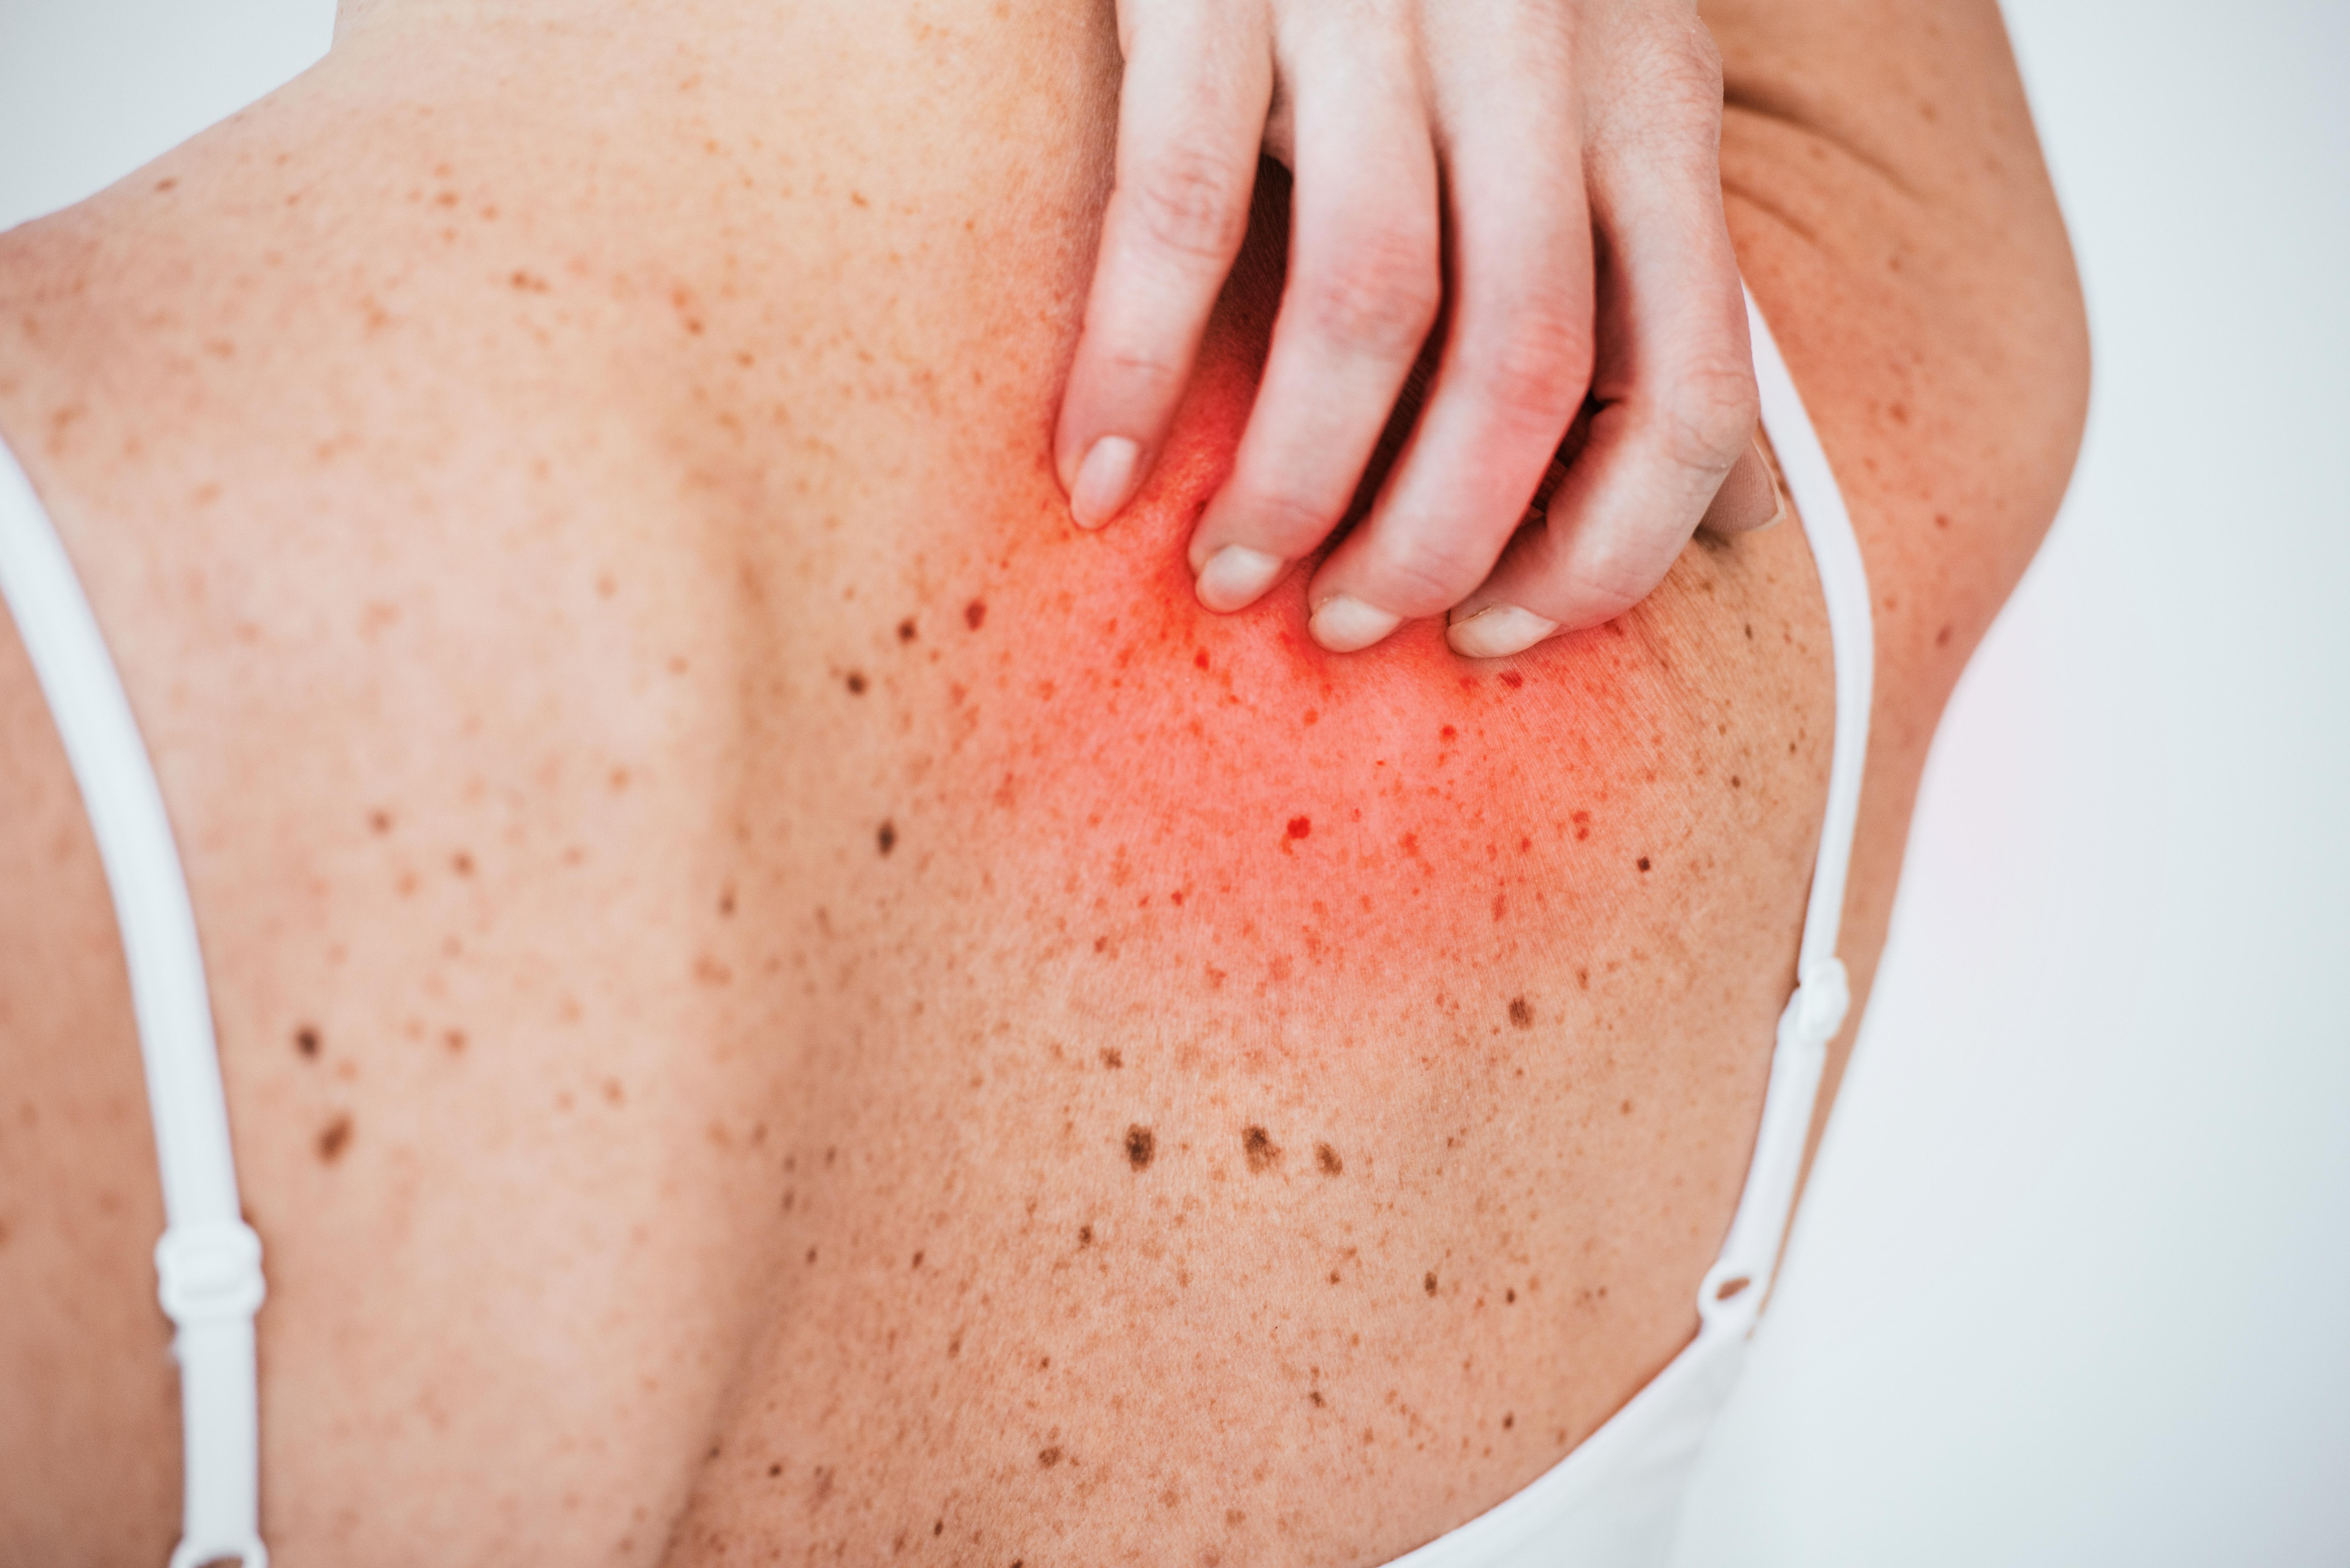 Scratch Mole, It Bleeds: Melanoma?